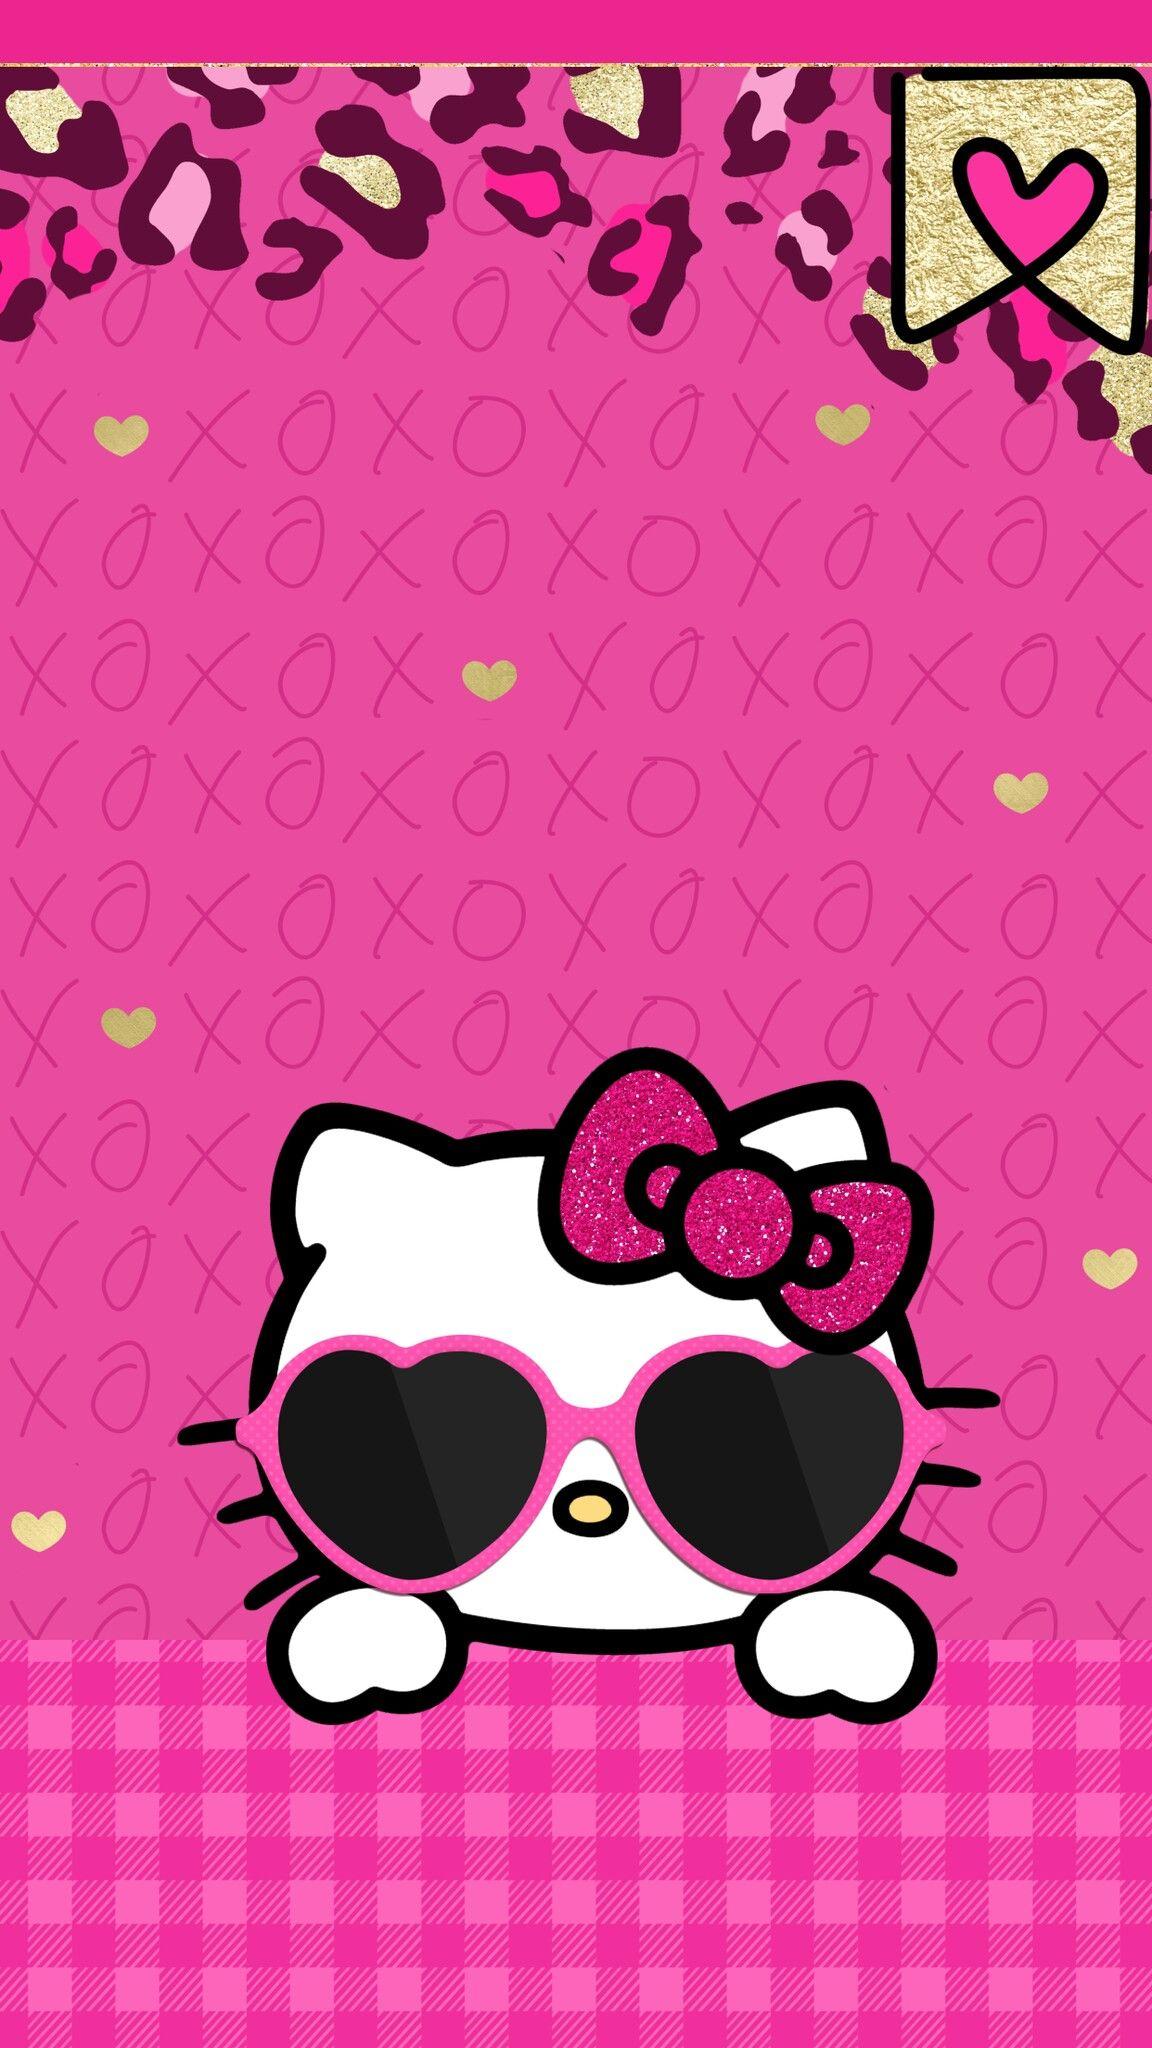 Popular Wallpaper Hello Kitty Smartphone - 48b1284277f8d91caadbee0edadfd434  Pic_95563.jpg